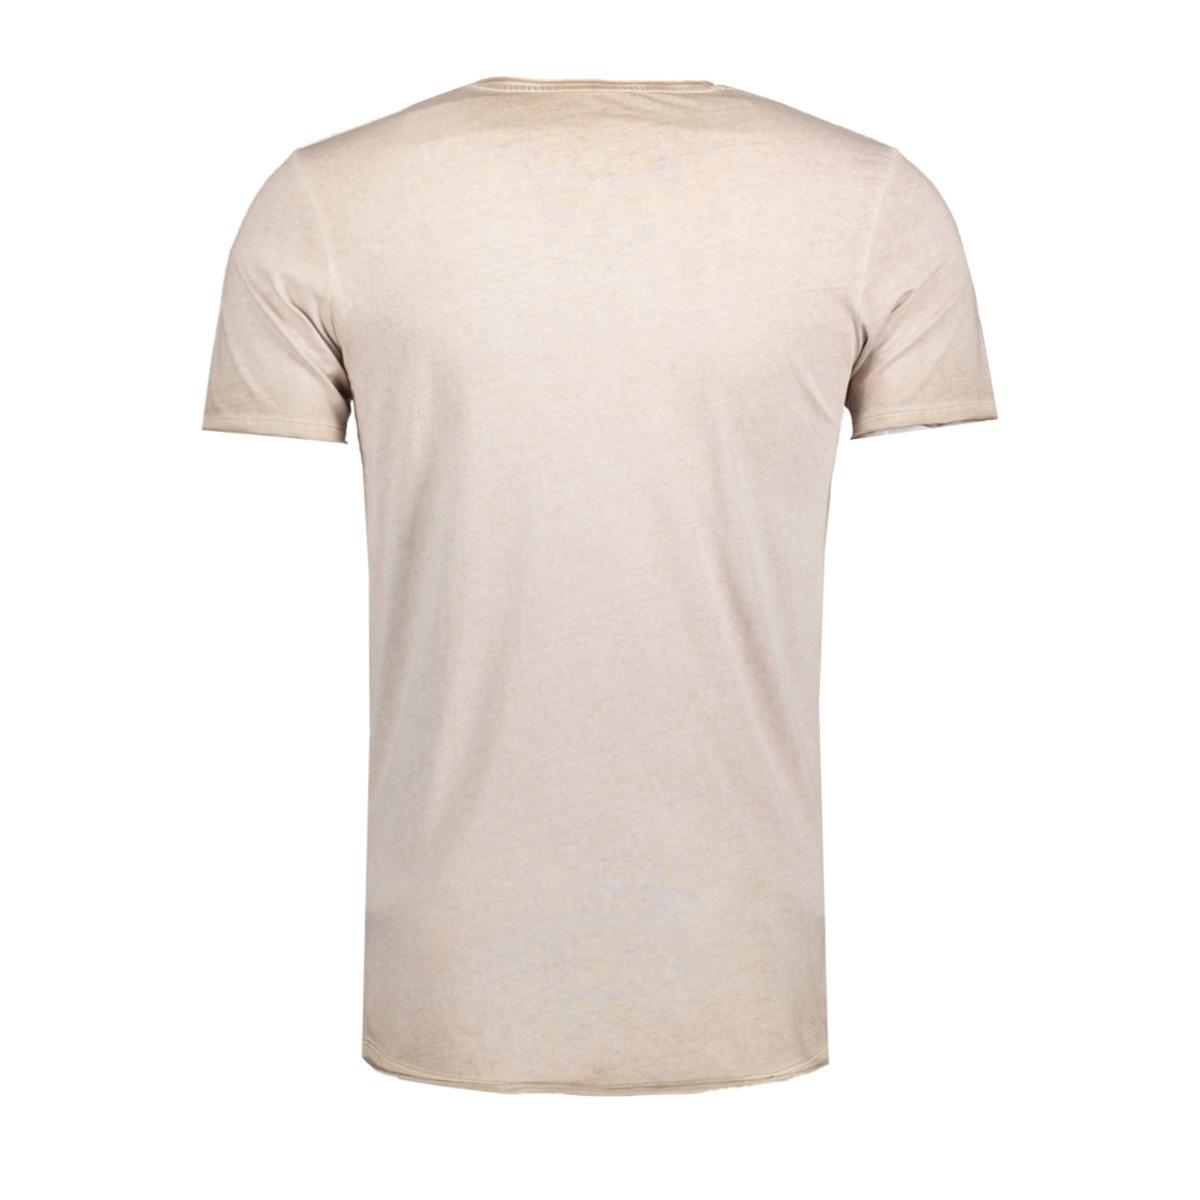 jjvjack ss tee crew neck noos 12103171 jack & jones t-shirt aluminium